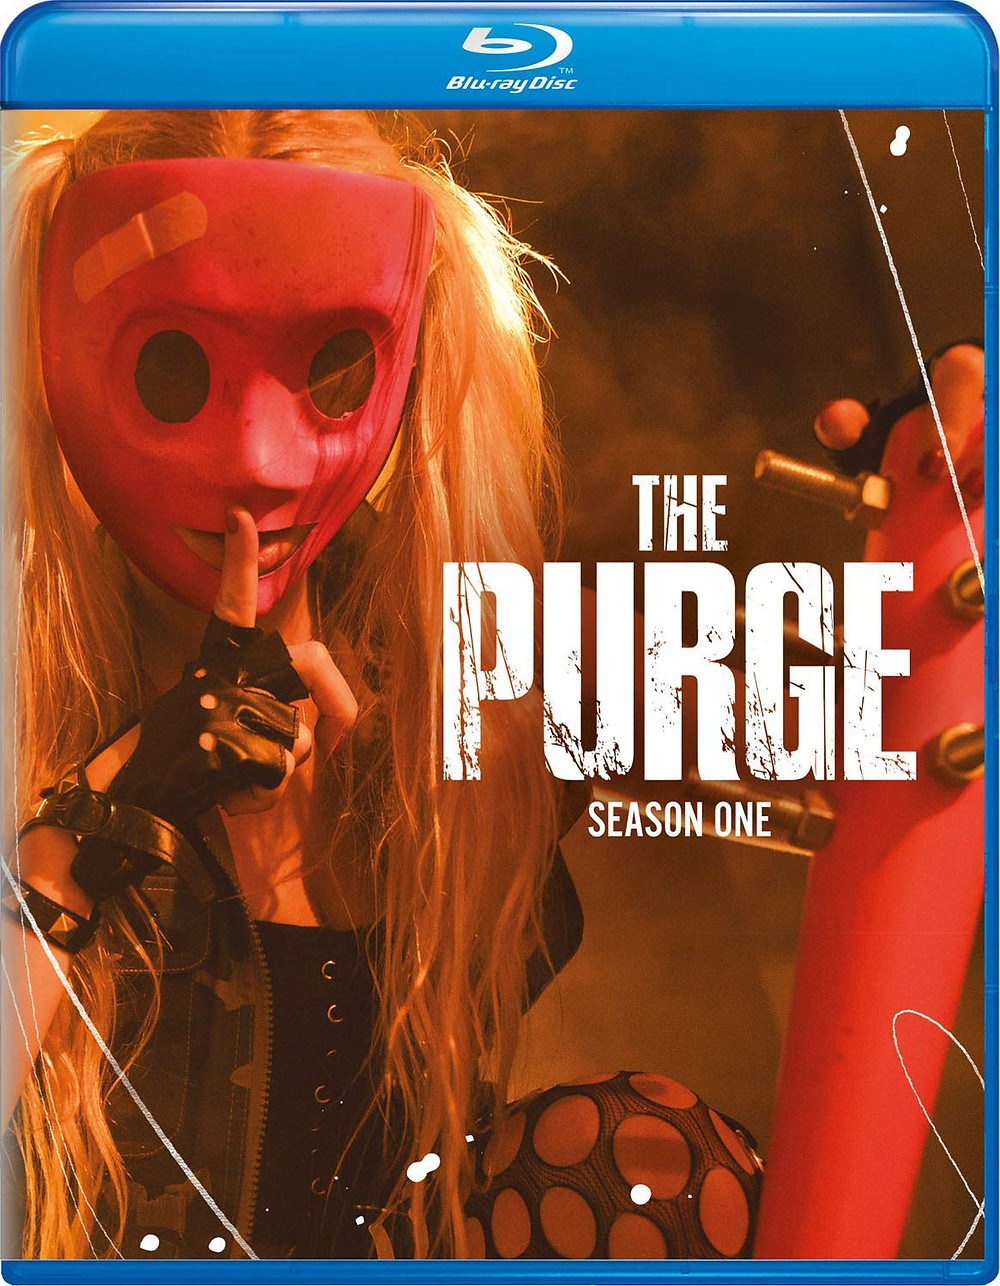 The Purge Series Blu-ray